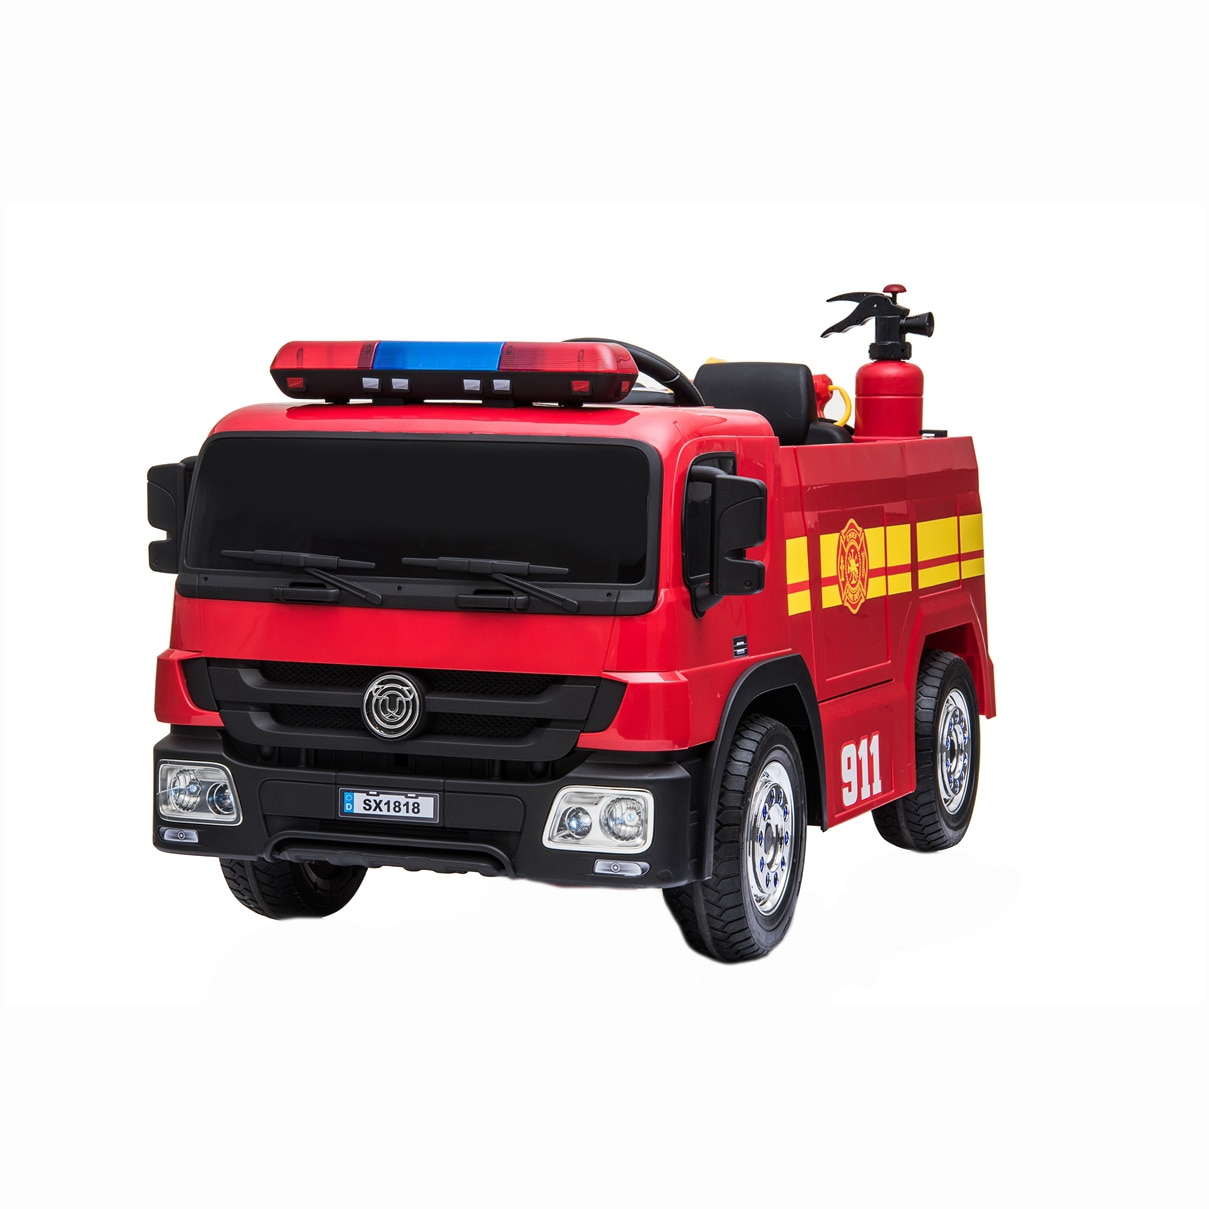 Fotografie Masinuta electrica pentru copii, Mappy - Pompieri